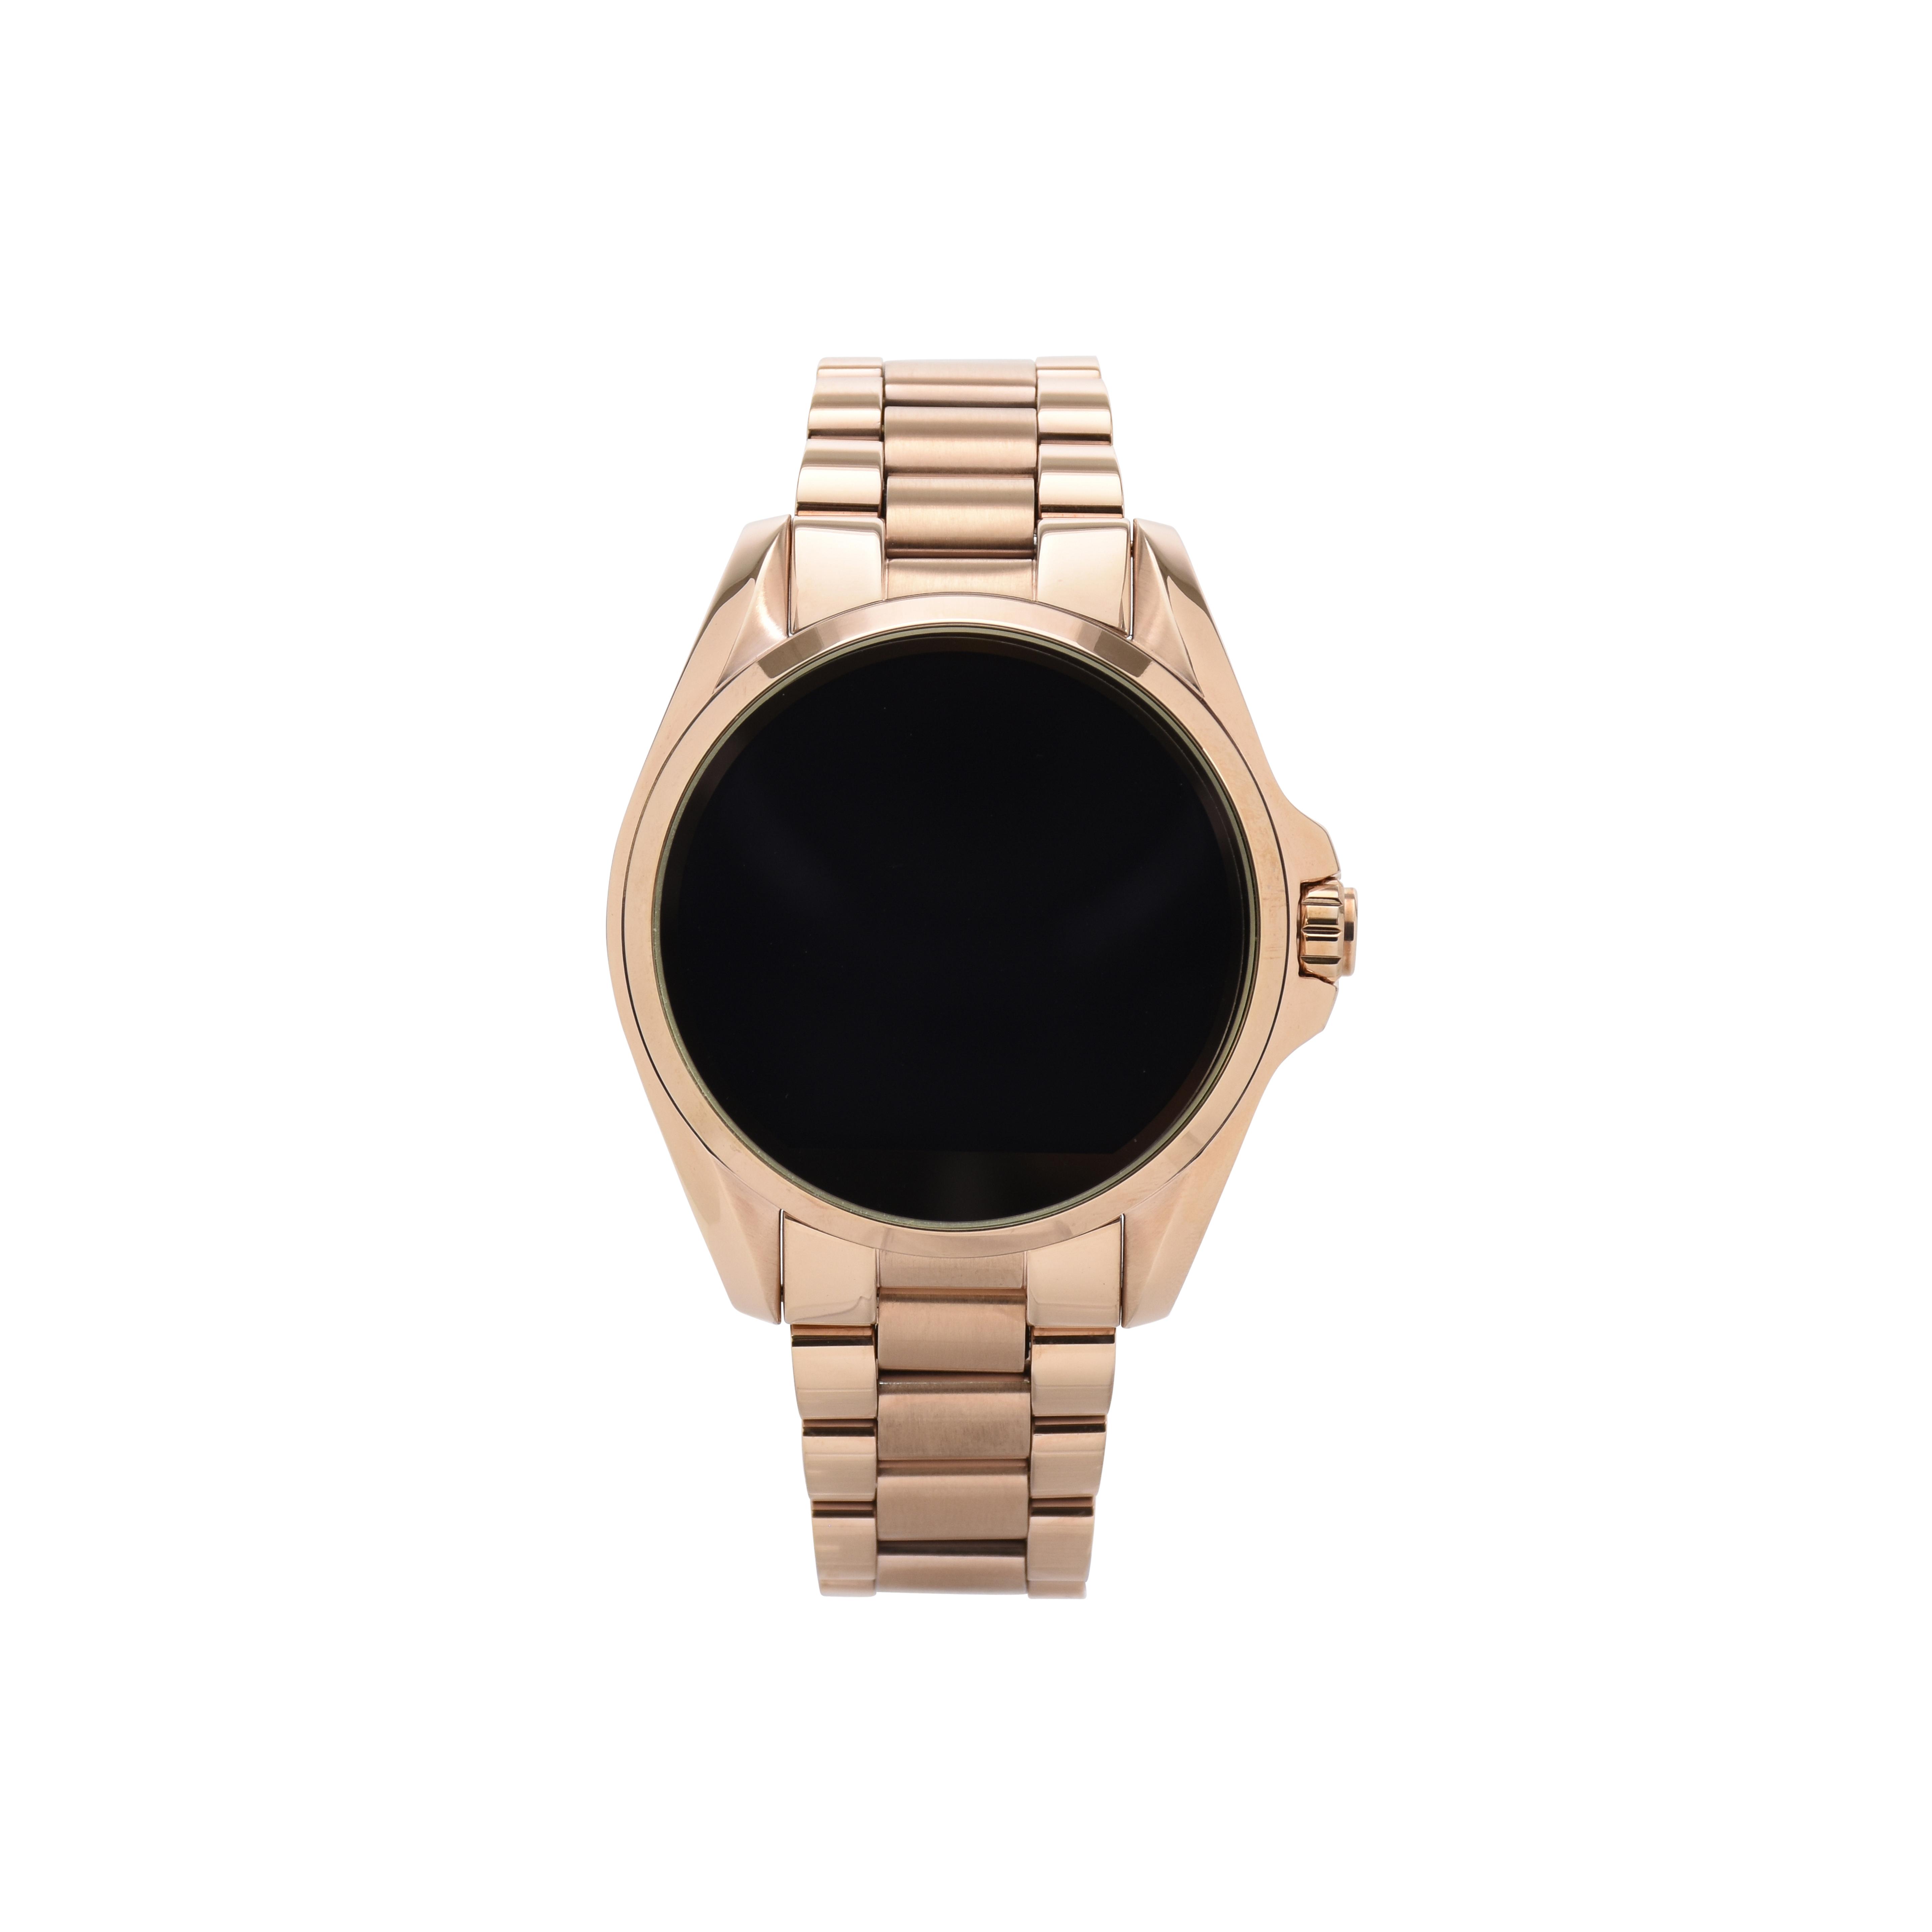 0a36f1bbafda Authentic Second Hand Michael Kors Bradshaw Rose Gold-tone Smartwatch  (PSS-356-00010)